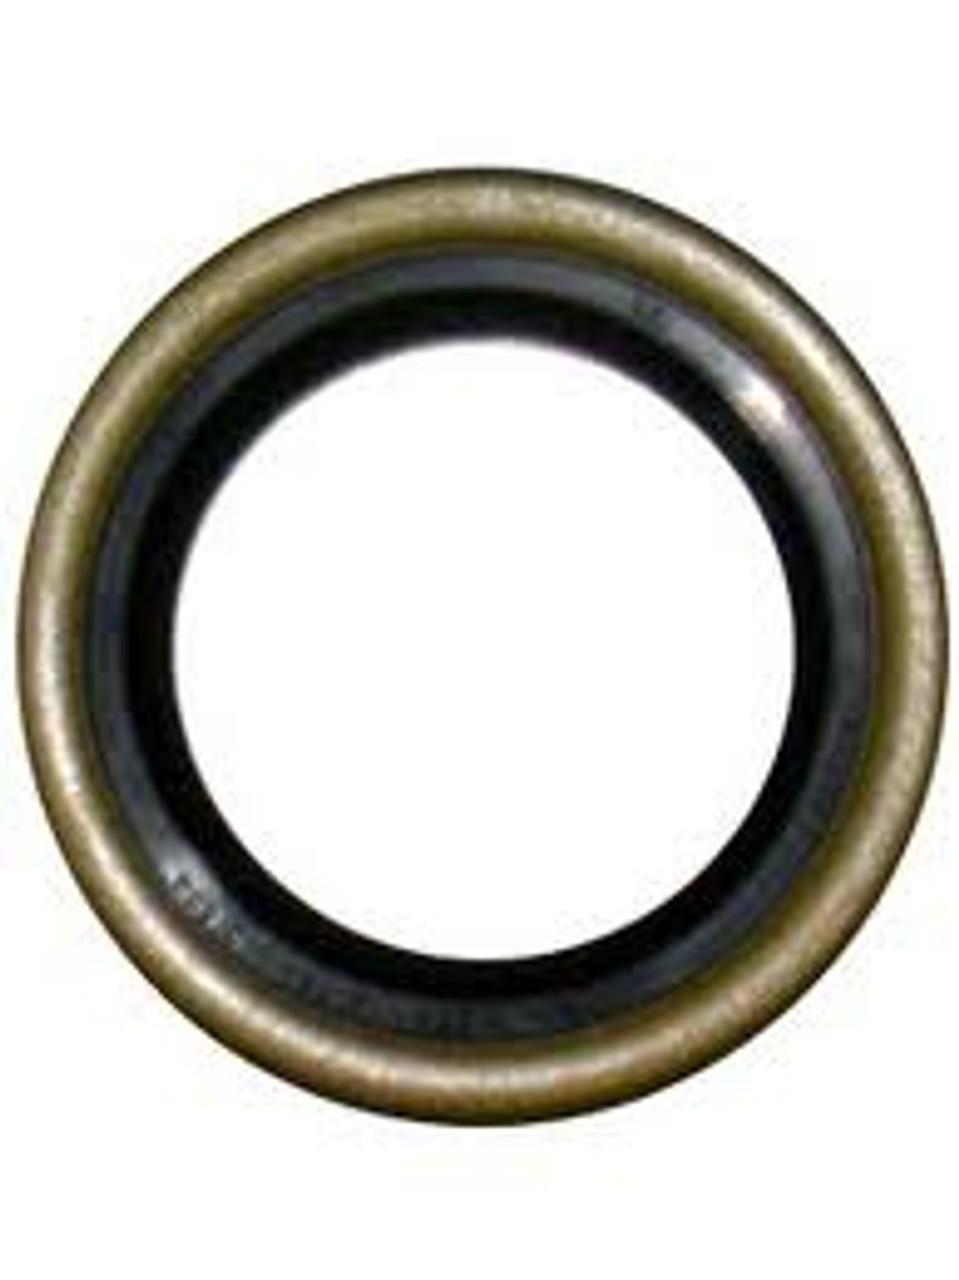 OEM Equivalent Radial Shaft Seal 171255VB-TC 5 Pack